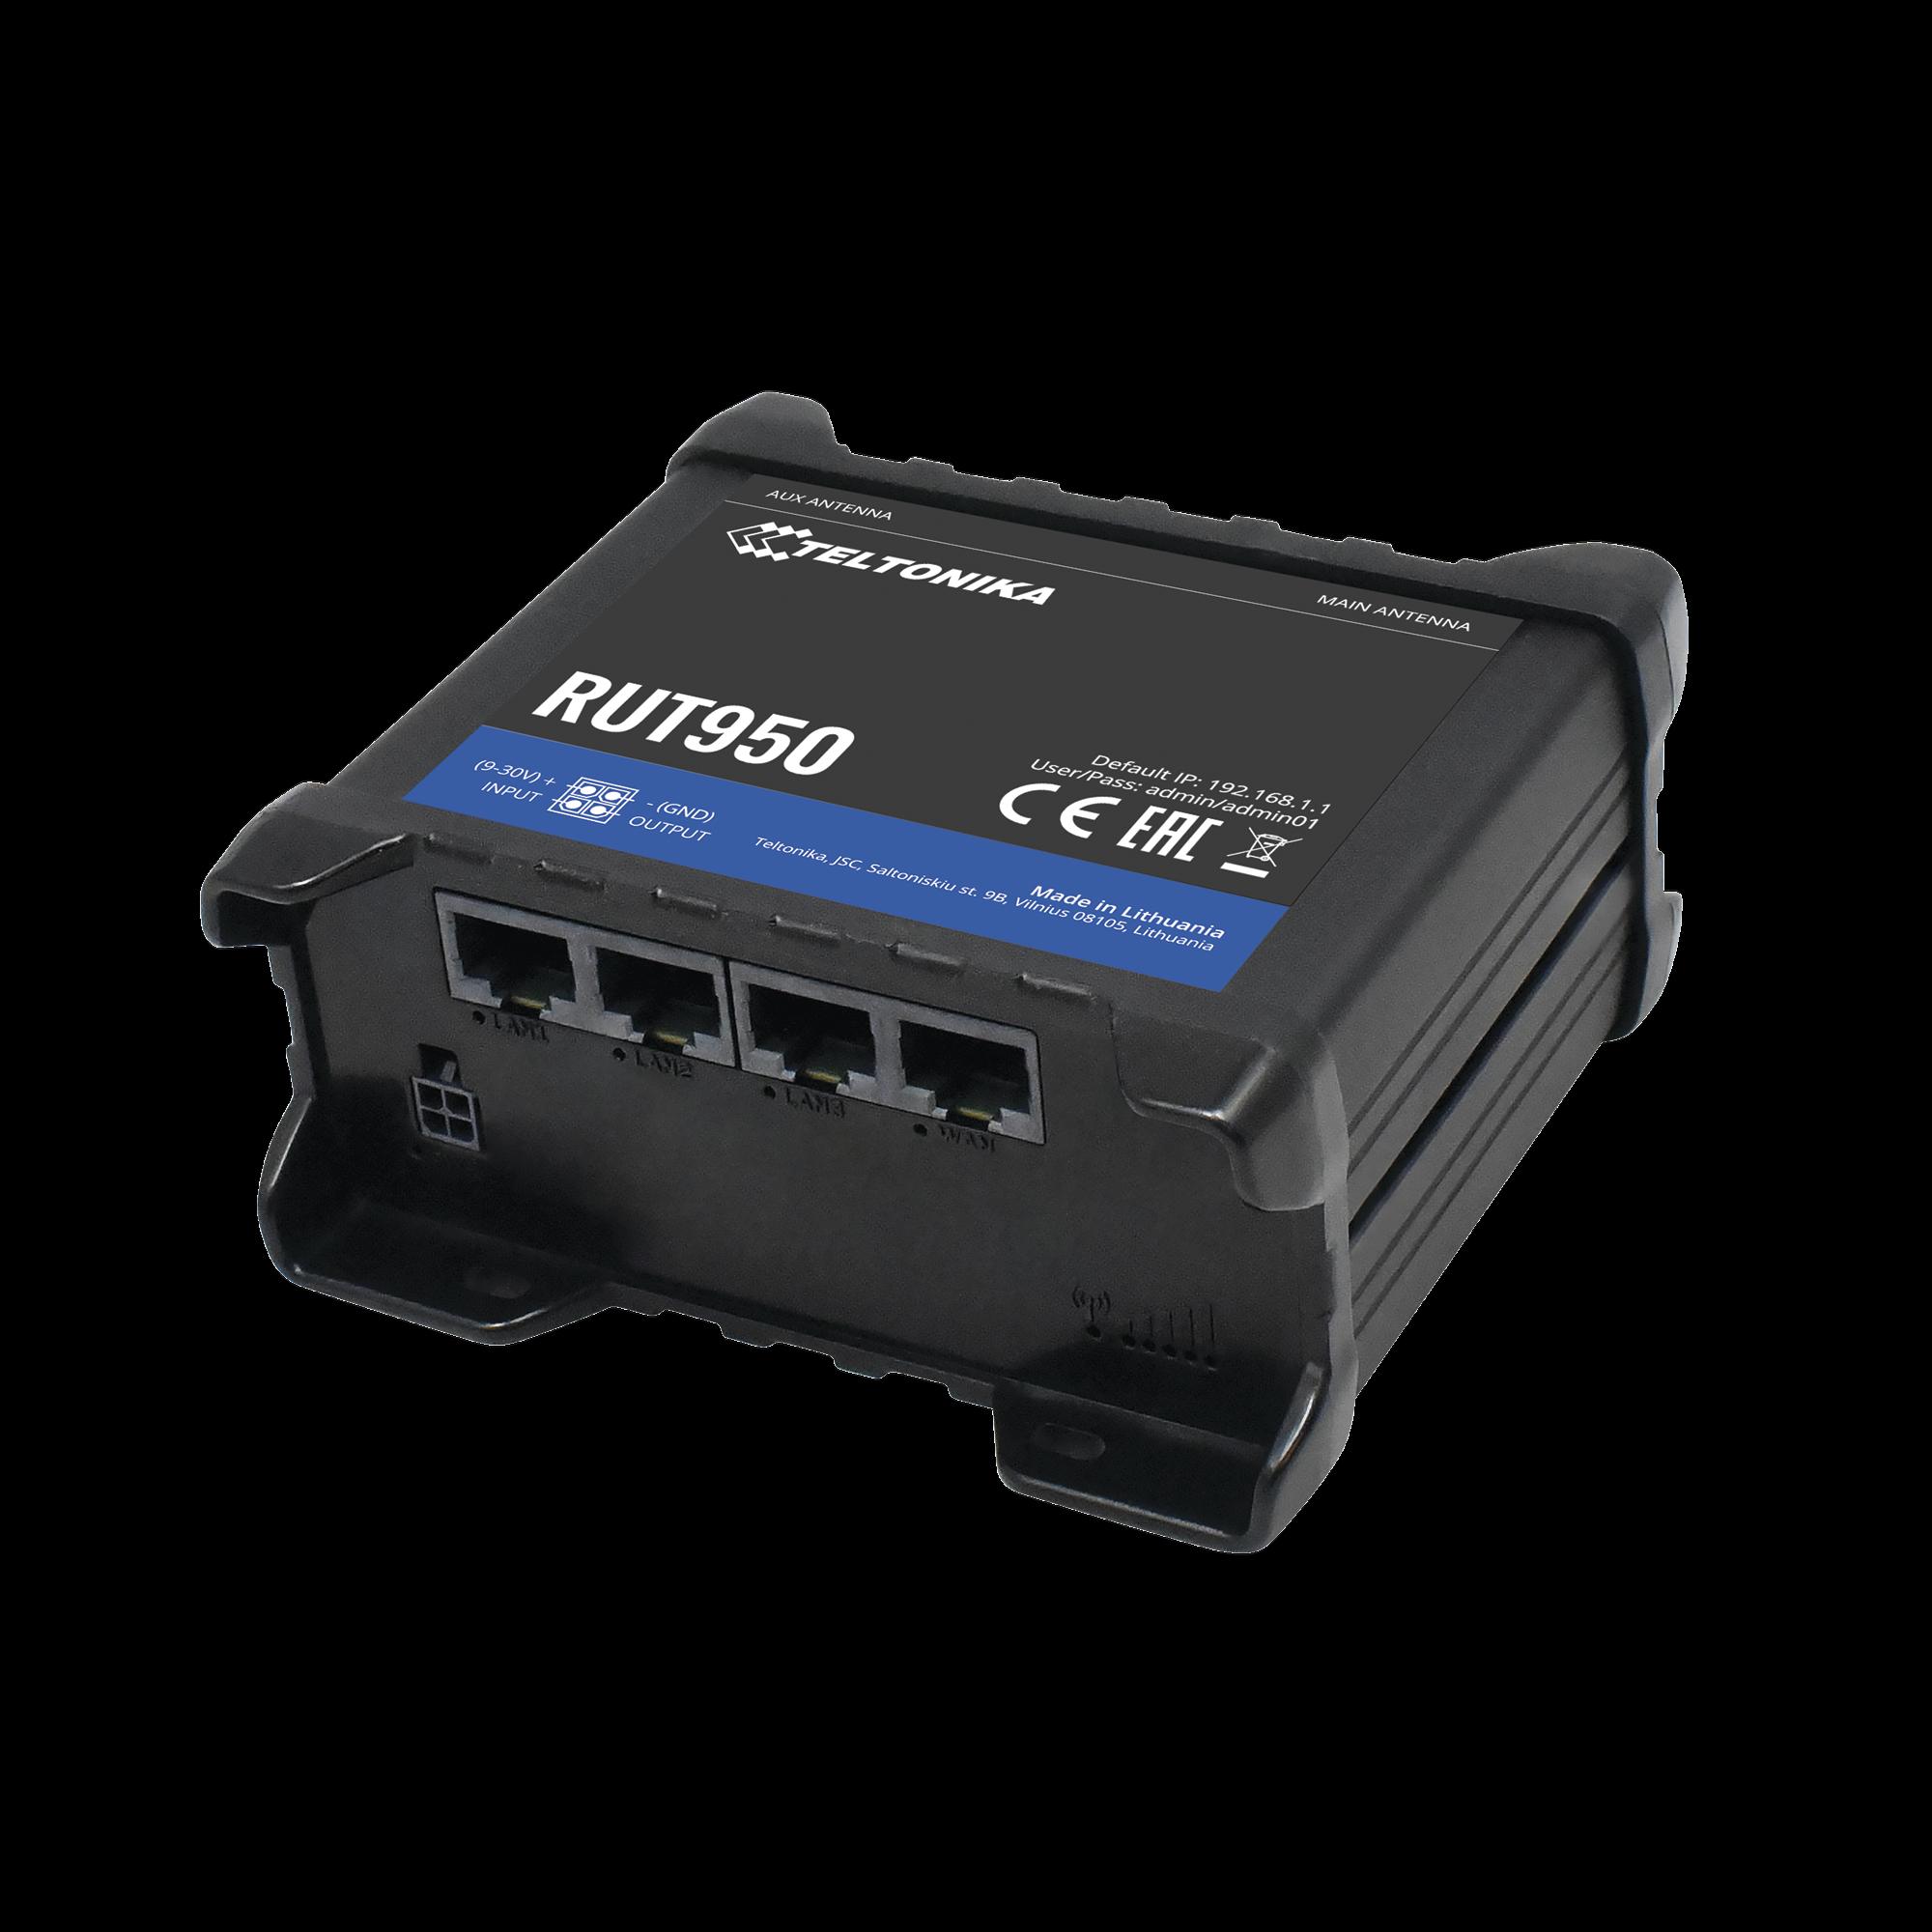 Router LTE dual SIM, 4 puertos Ethernet, conectorizado, Bandas B1, B2, B3, B4, B5, B7, B8, B28